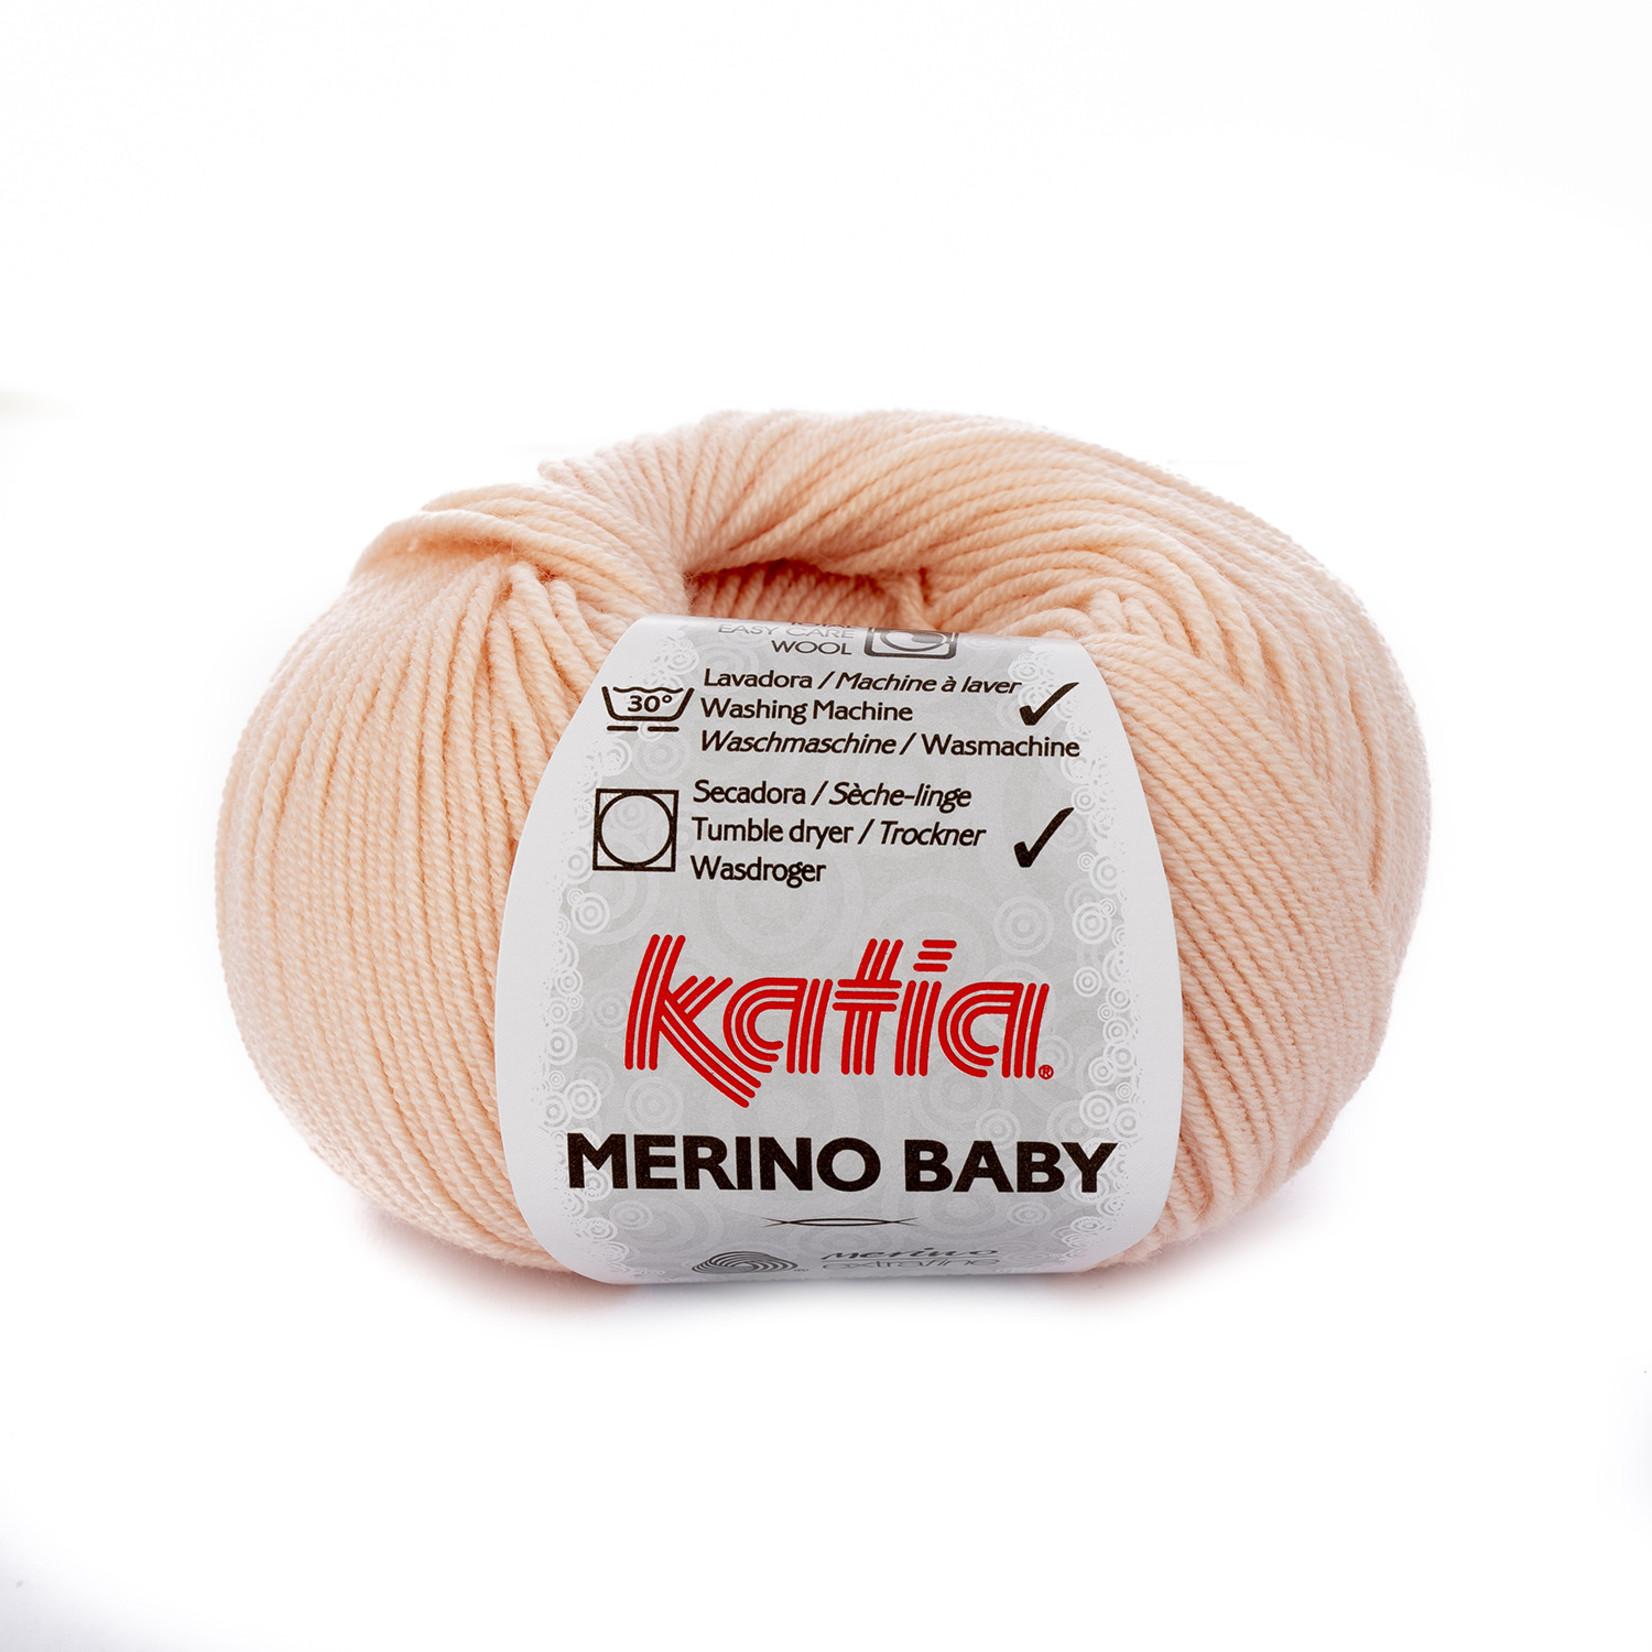 Katia Katia Merino Baby - 81 - Zeer licht bleekrood - 50 gr. = 165 m.